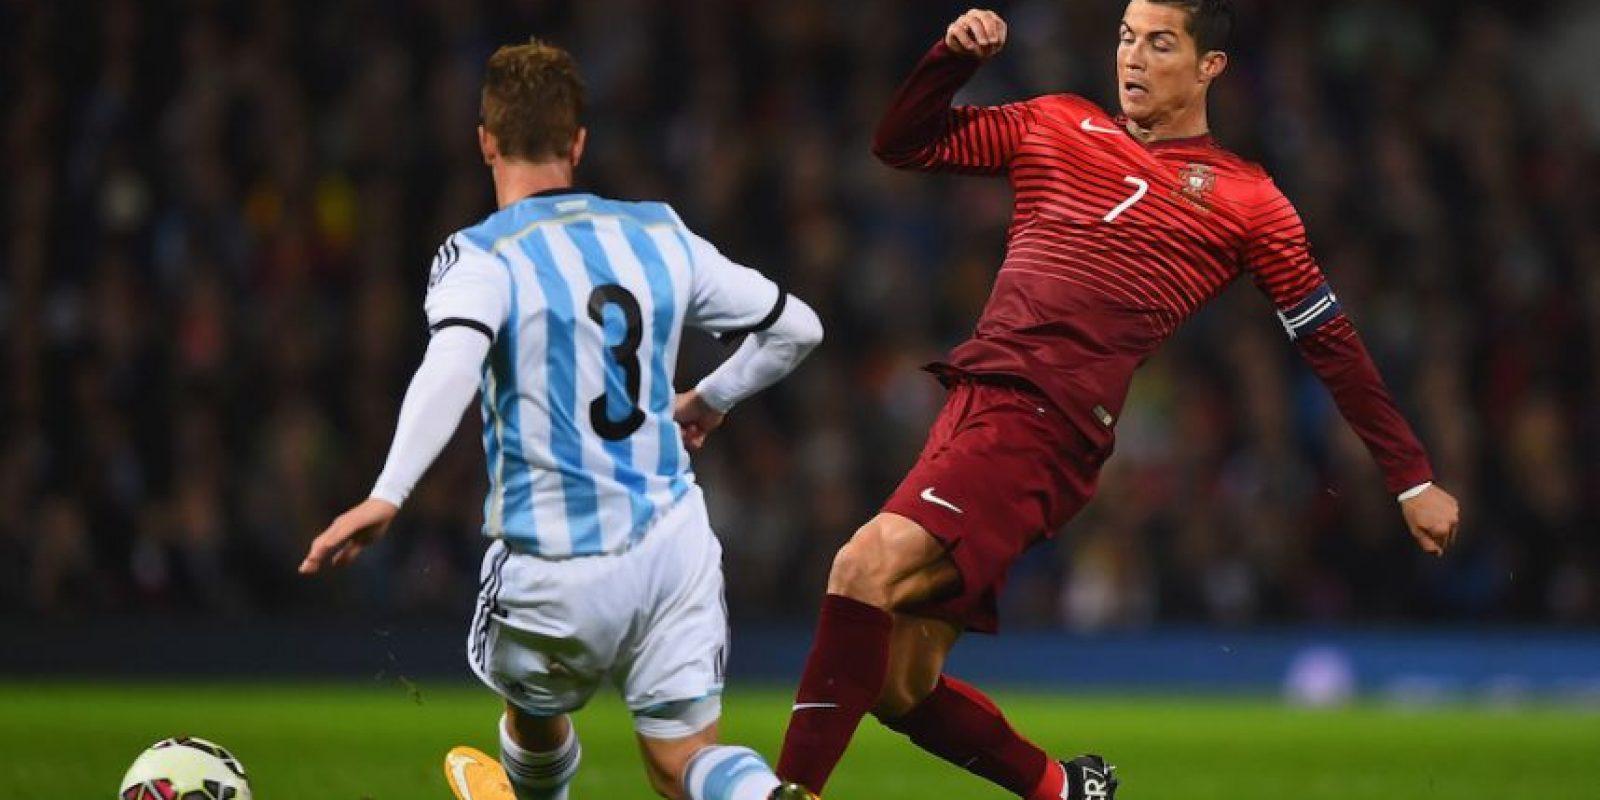 CR7 peleando un balón ante la zaga argentina. Foto:Getty Images